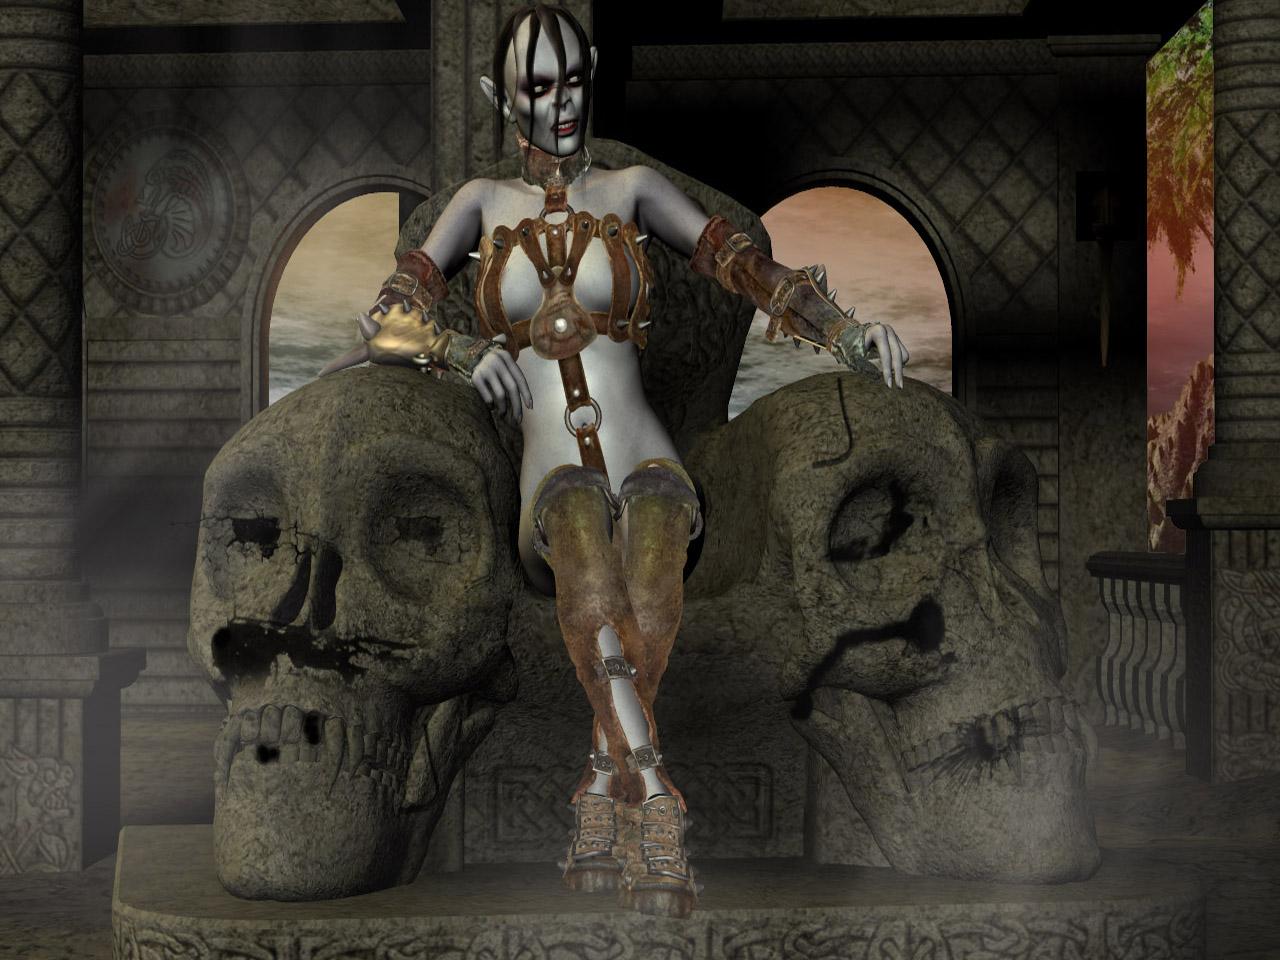 3D horror vampayrs xvdios pics sex beauty hoe